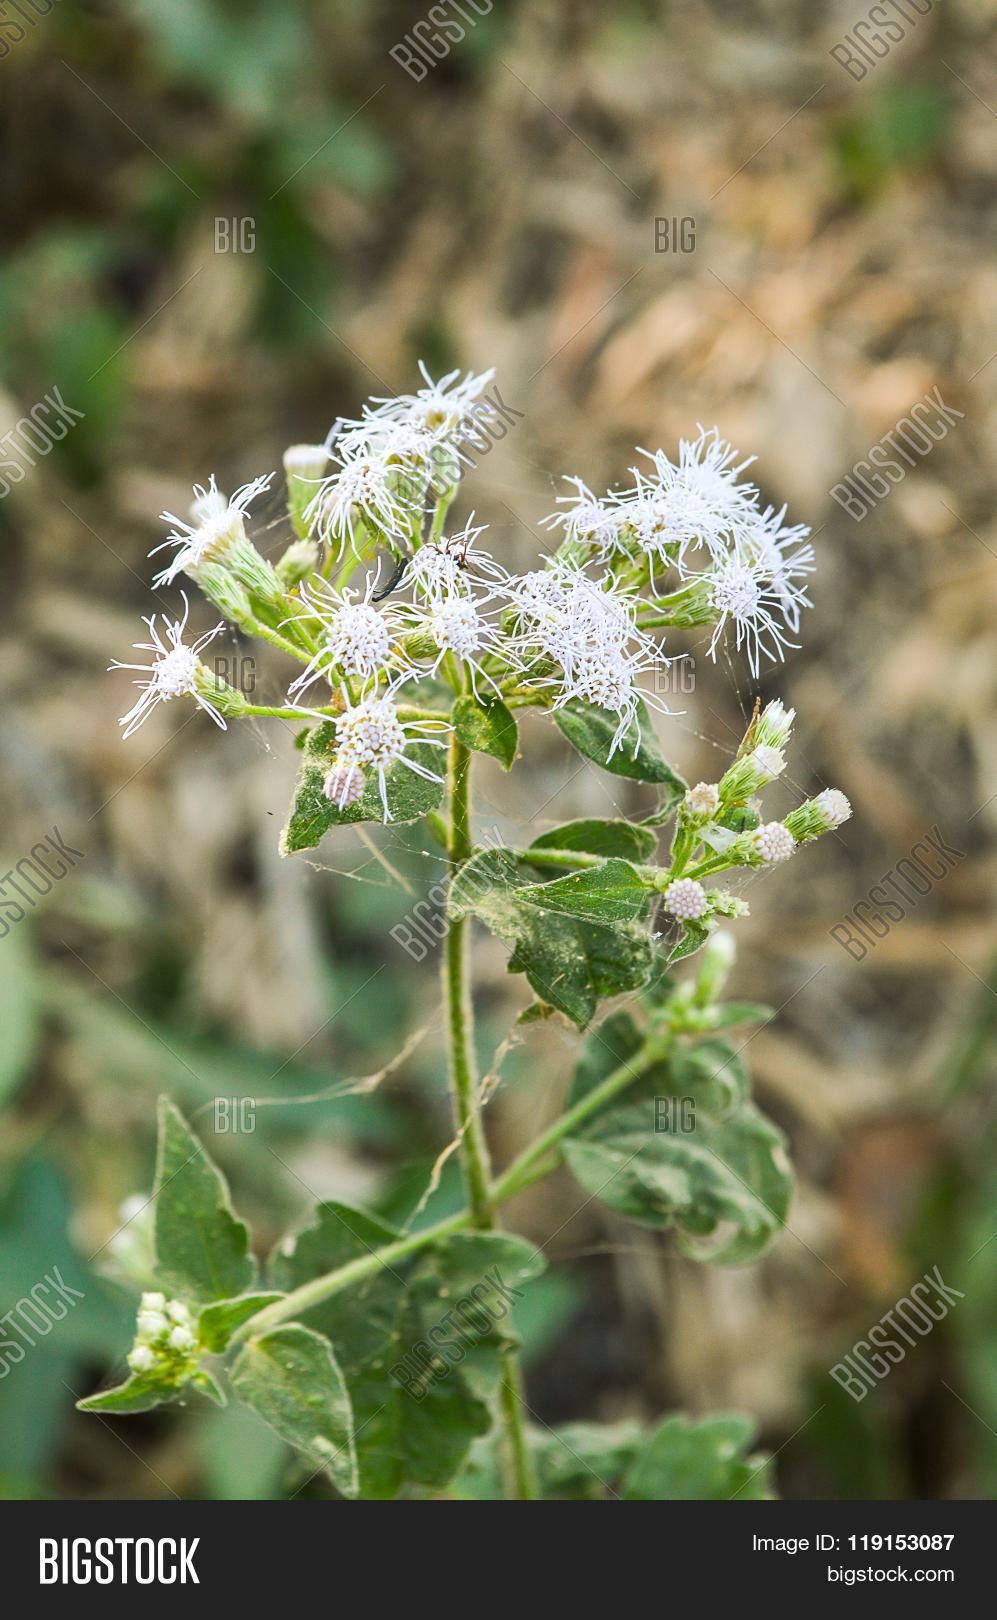 Close White Siam Weed Image & Photo (Free Trial) | Bigstock